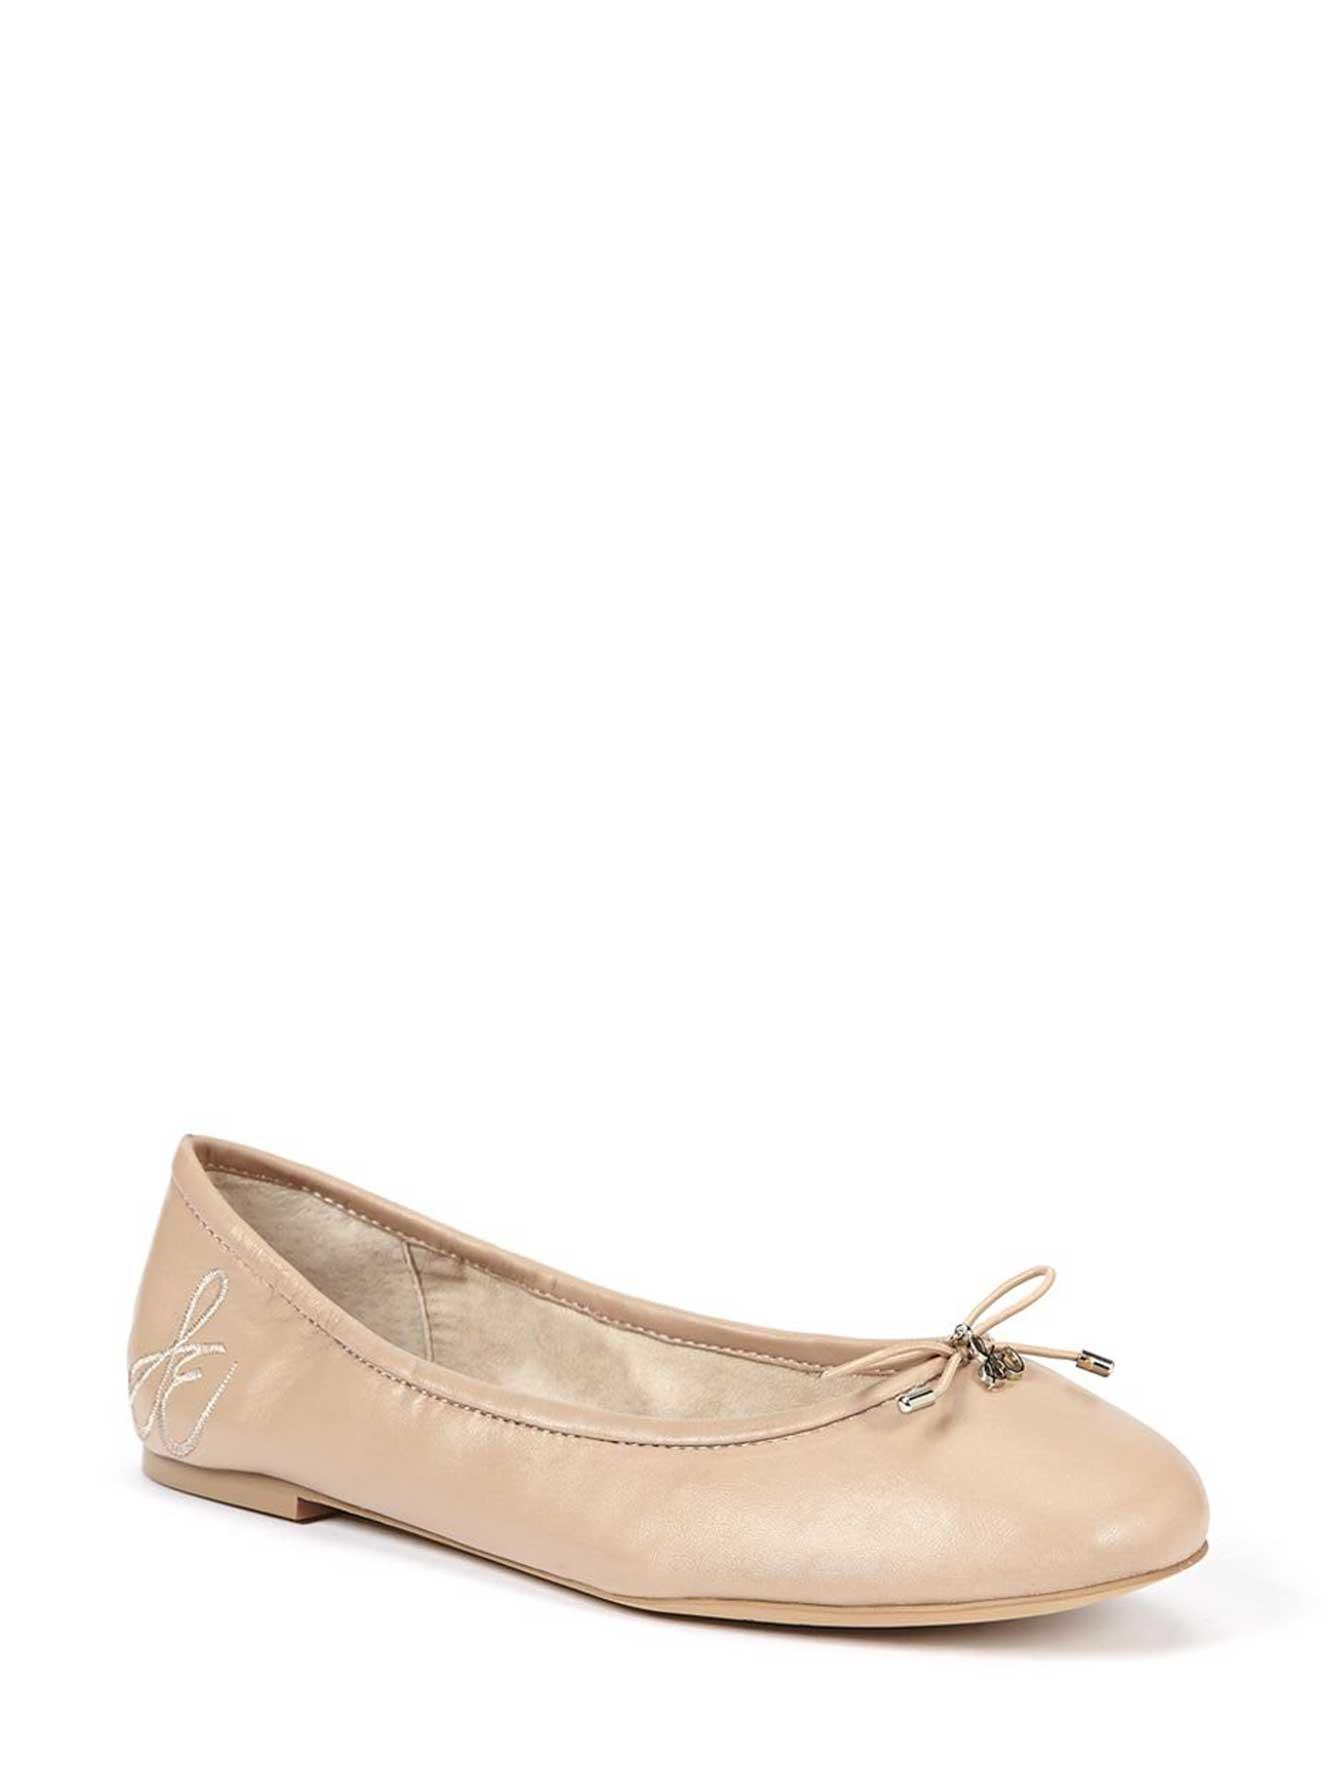 601c0b2c60fc Sam Edelman Felicia Ballerina Shoe